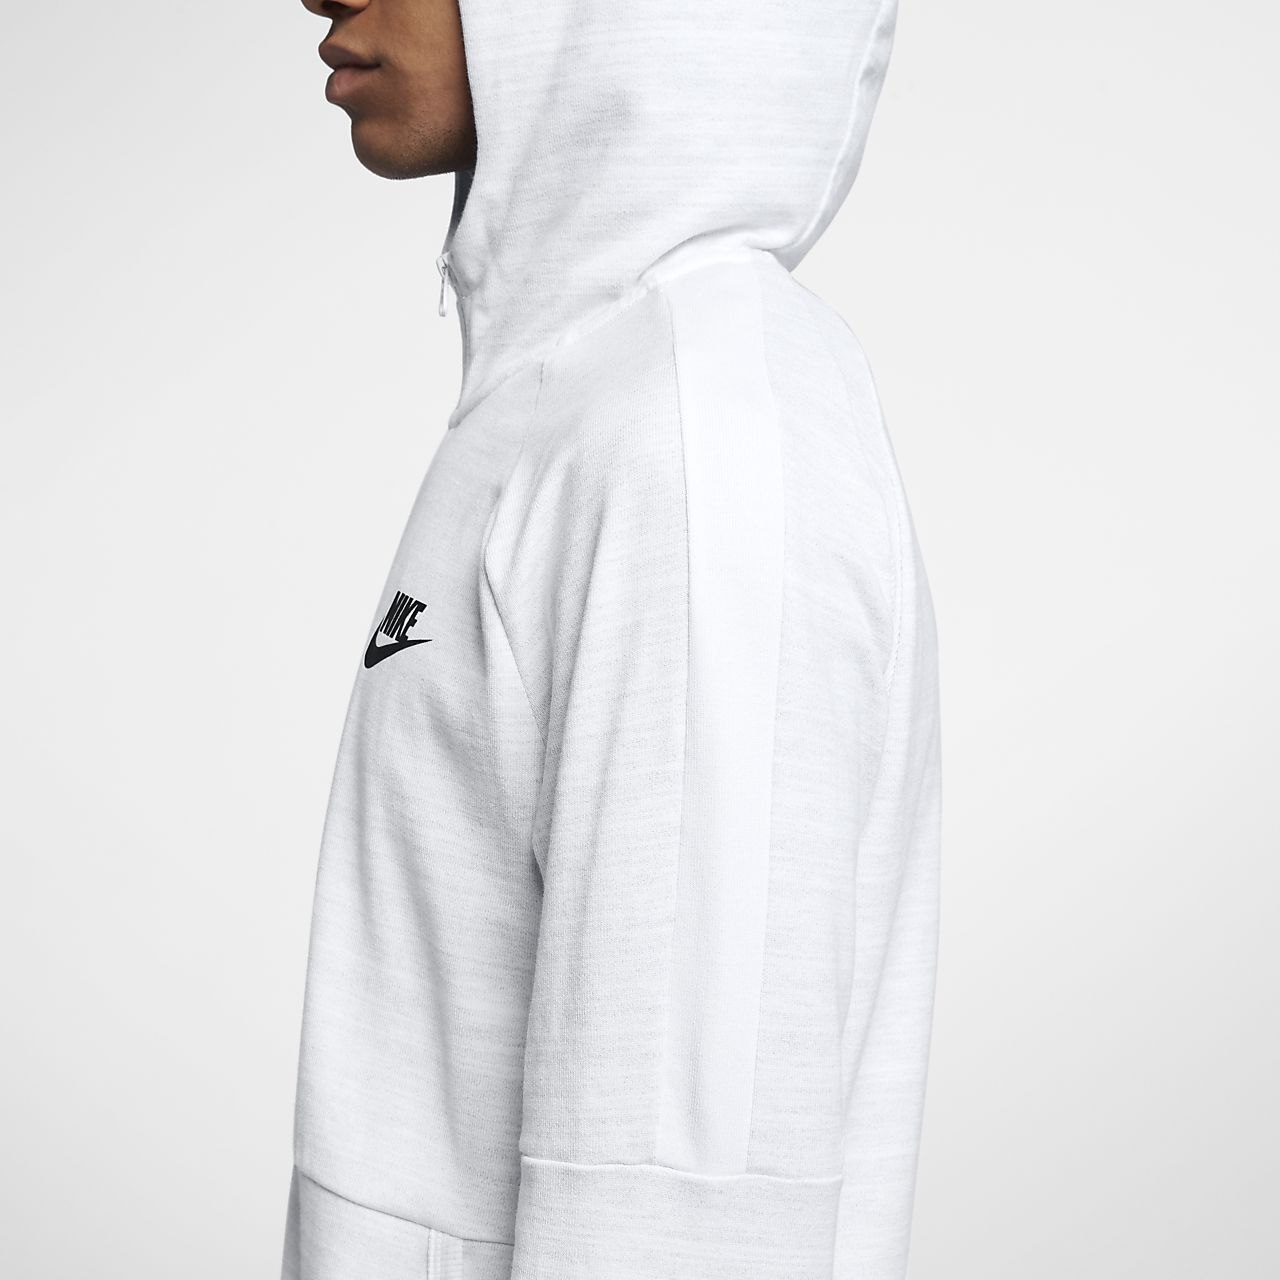 df871dc95d67 Nike Sportswear Advance 15 Men s Full-Zip Hoodie. Nike.com AU